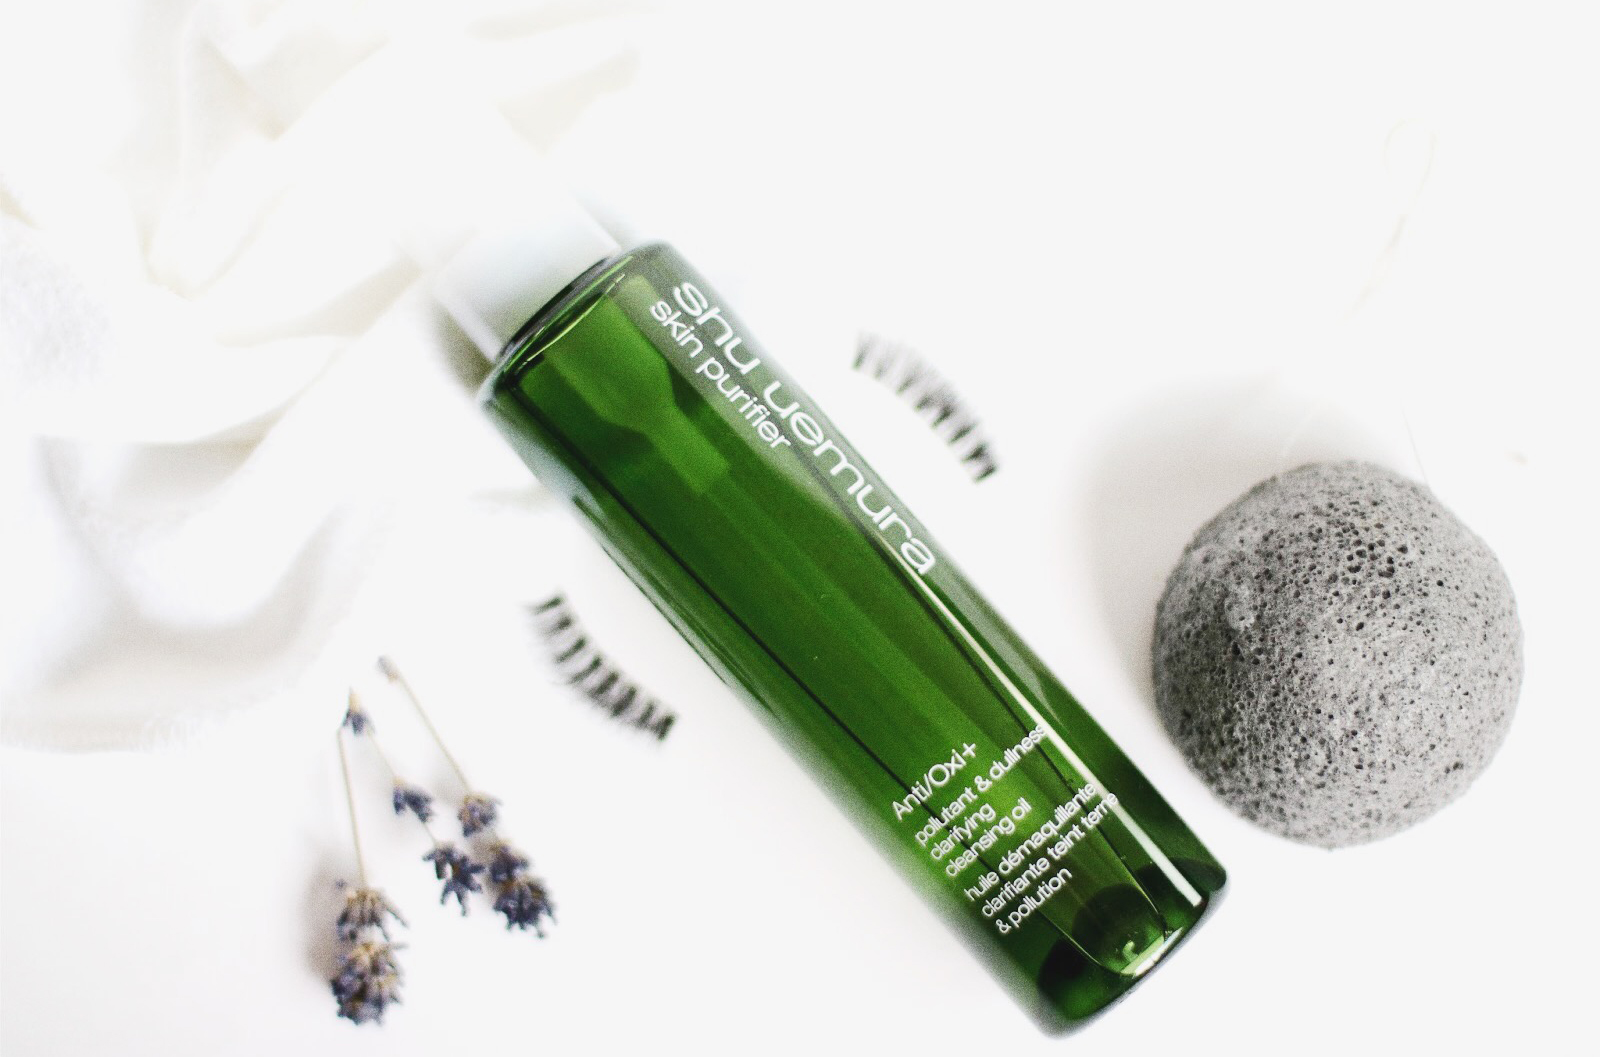 shu uemura huile démaquillante anti oxi + avis test sans huile minerale